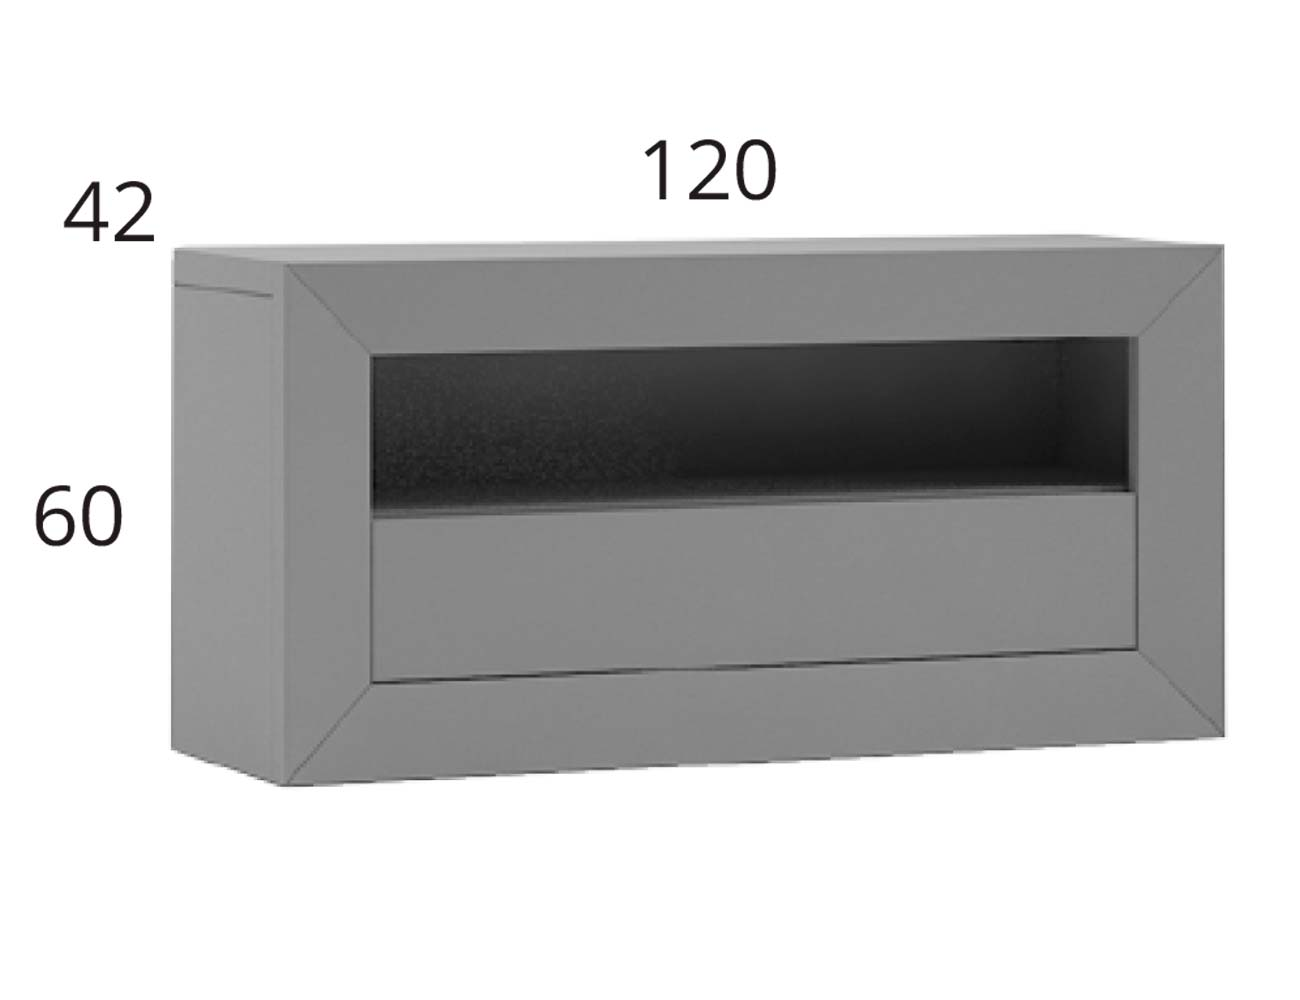 A0601